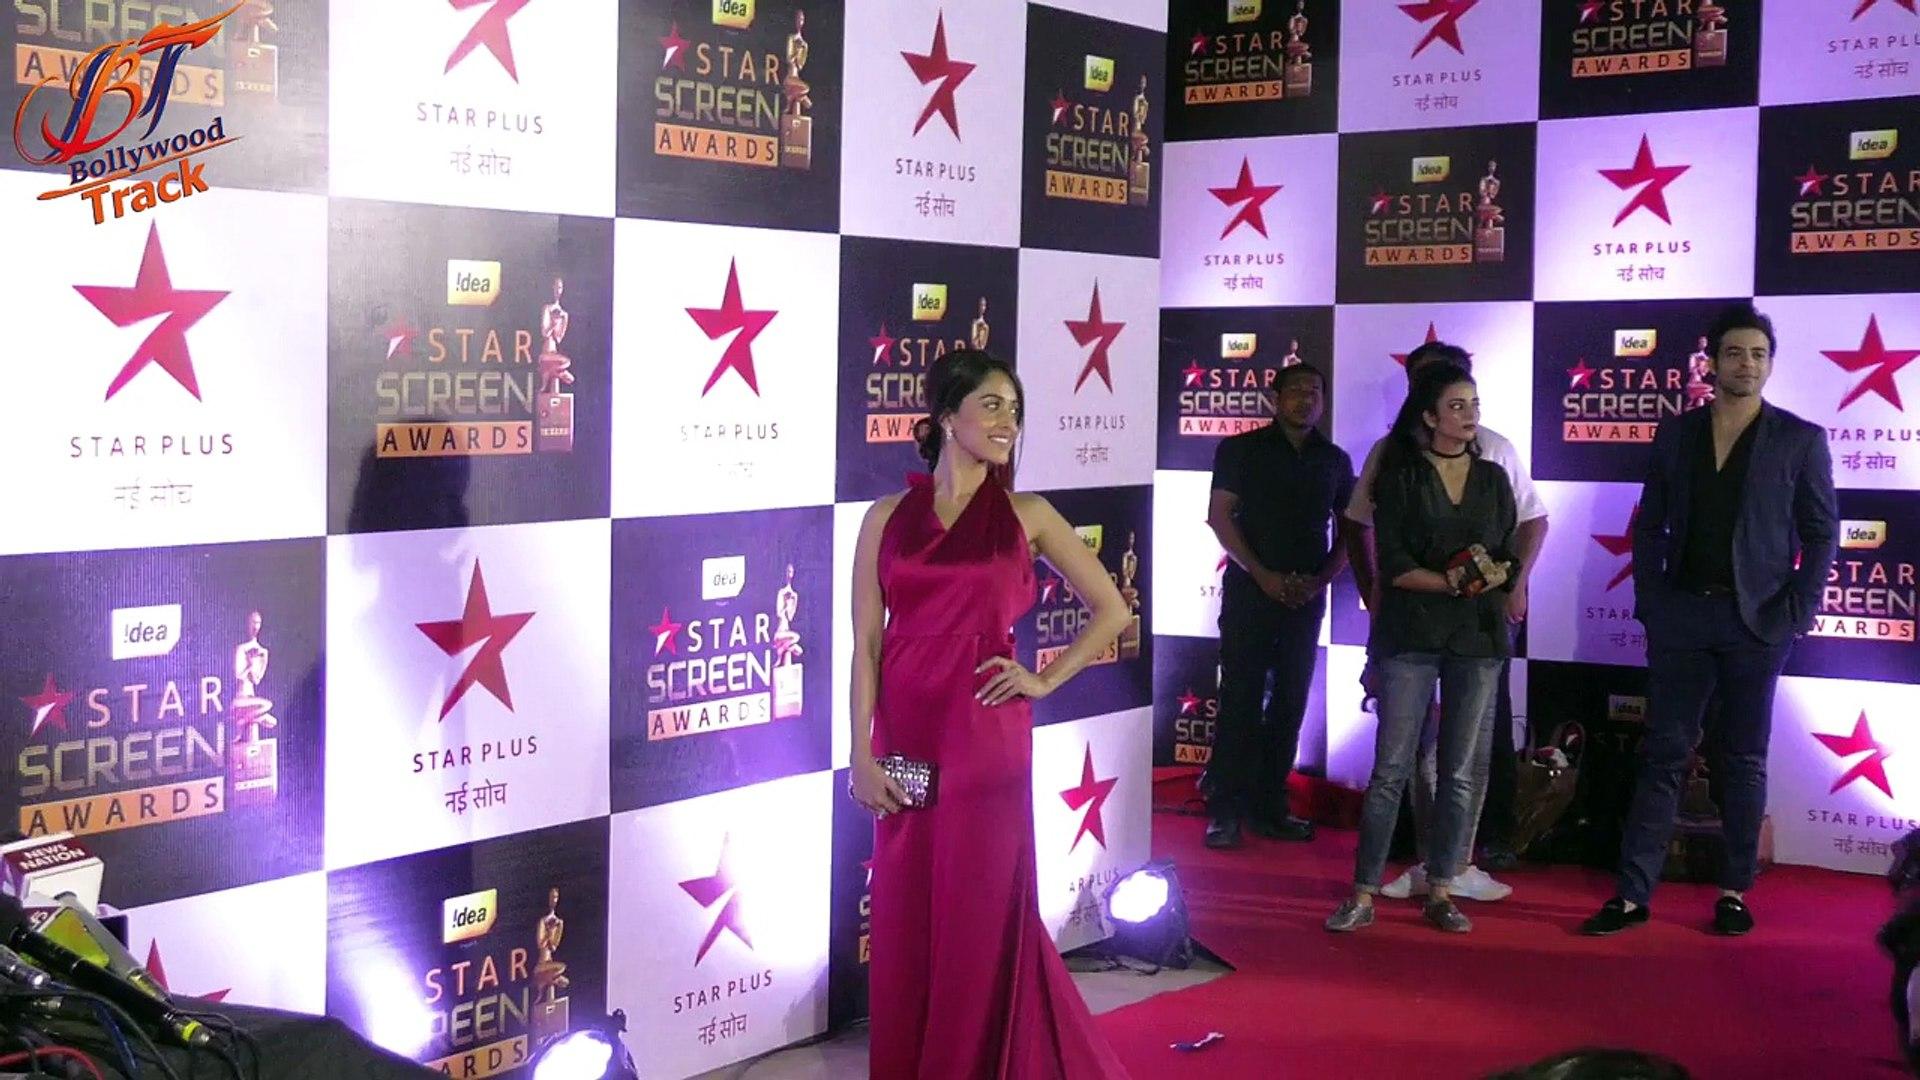 Nushrat Bharucha at Star Screen Awards 2016